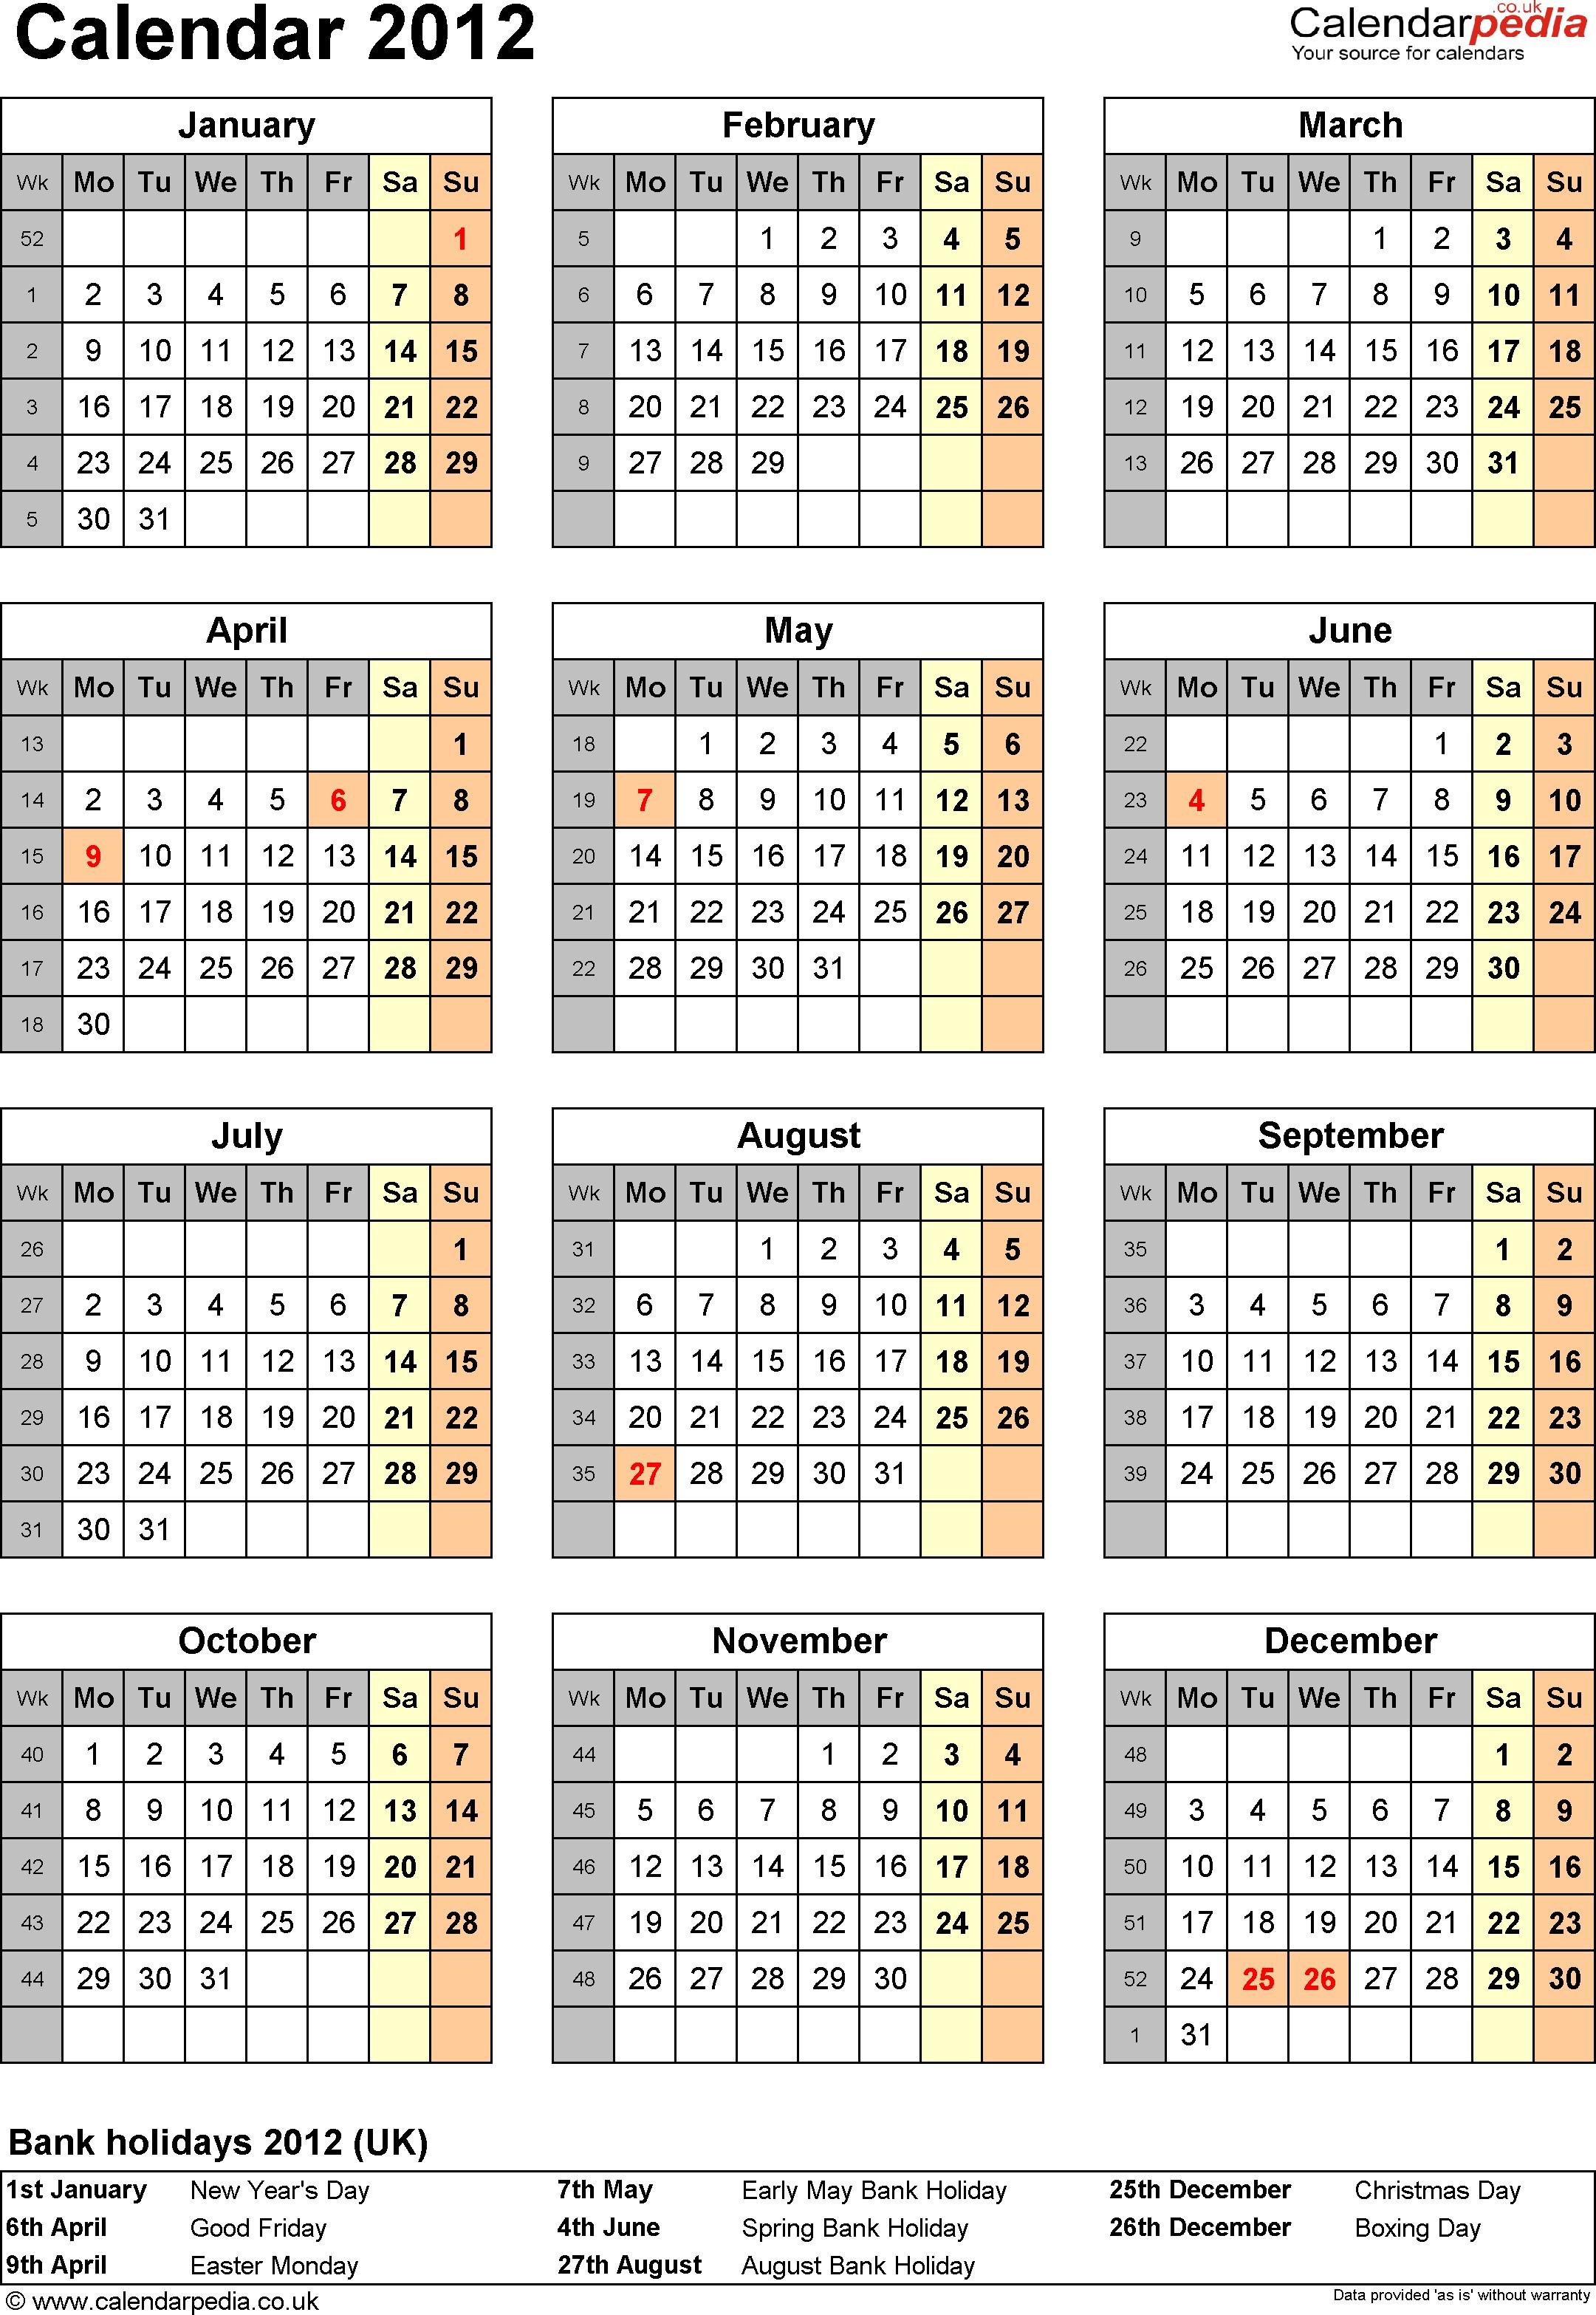 Printable Uk Calendar Calendar 2012 Uk with Bank Holidays and Week Numbers